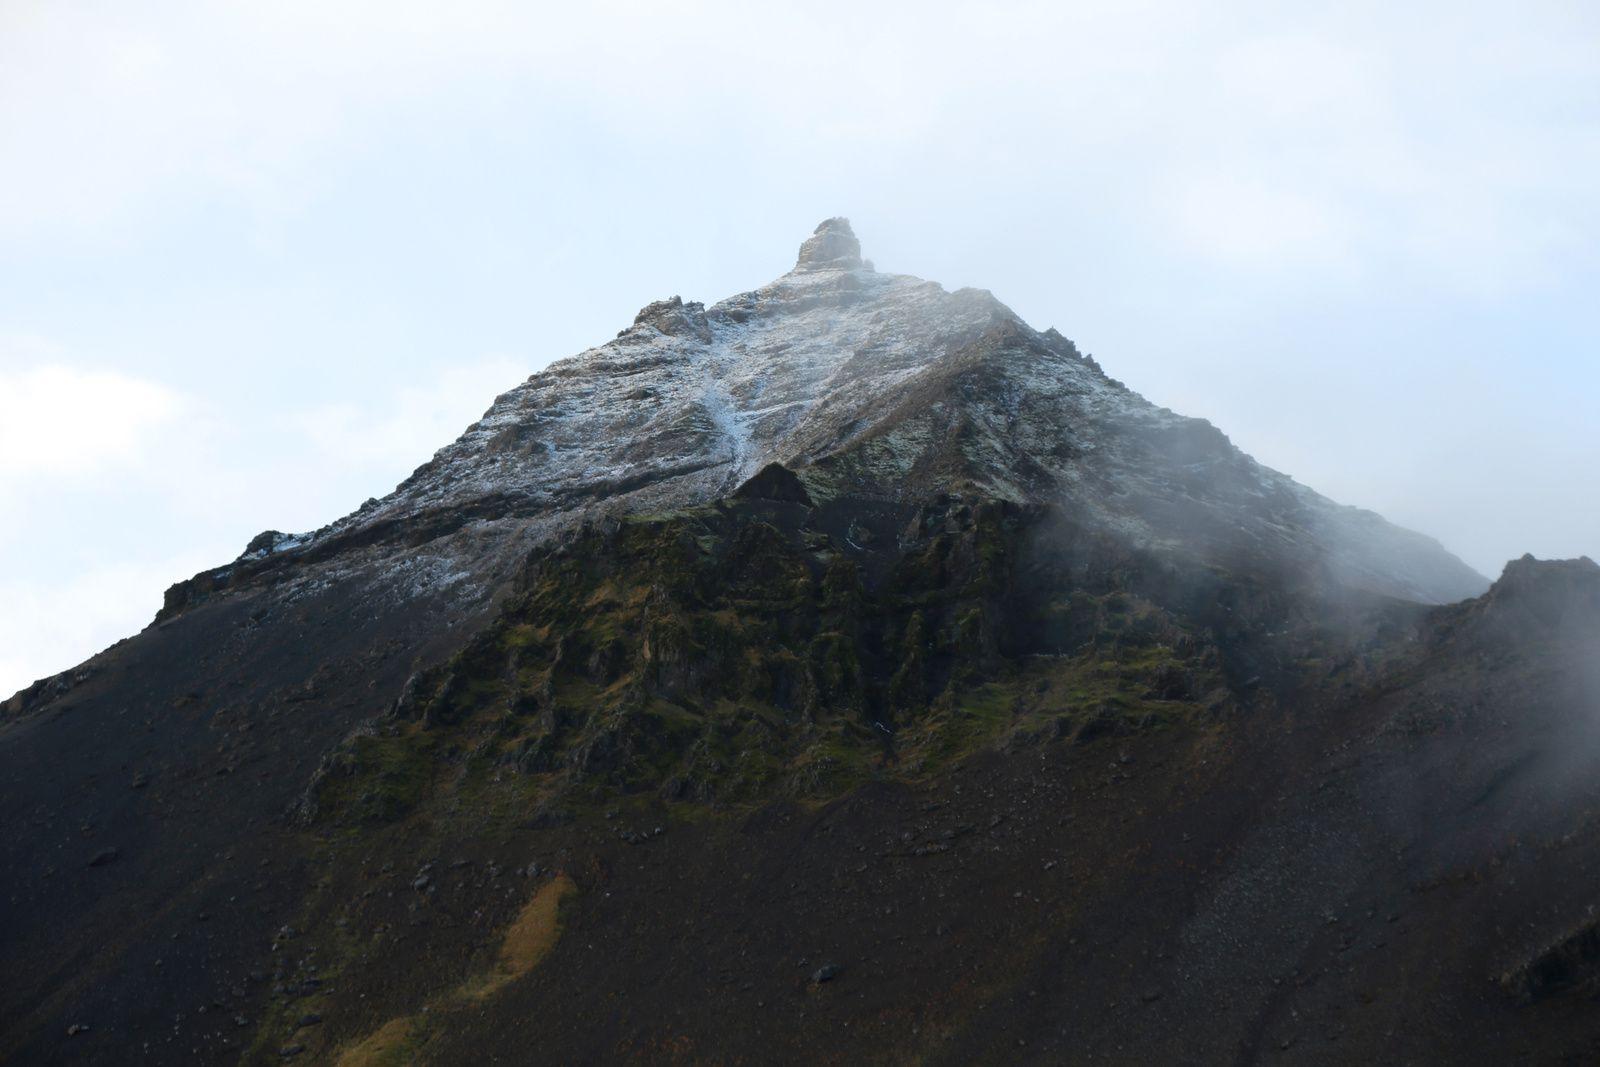 The Stapafell volcano - photo © Bernard Duyck 10.2016